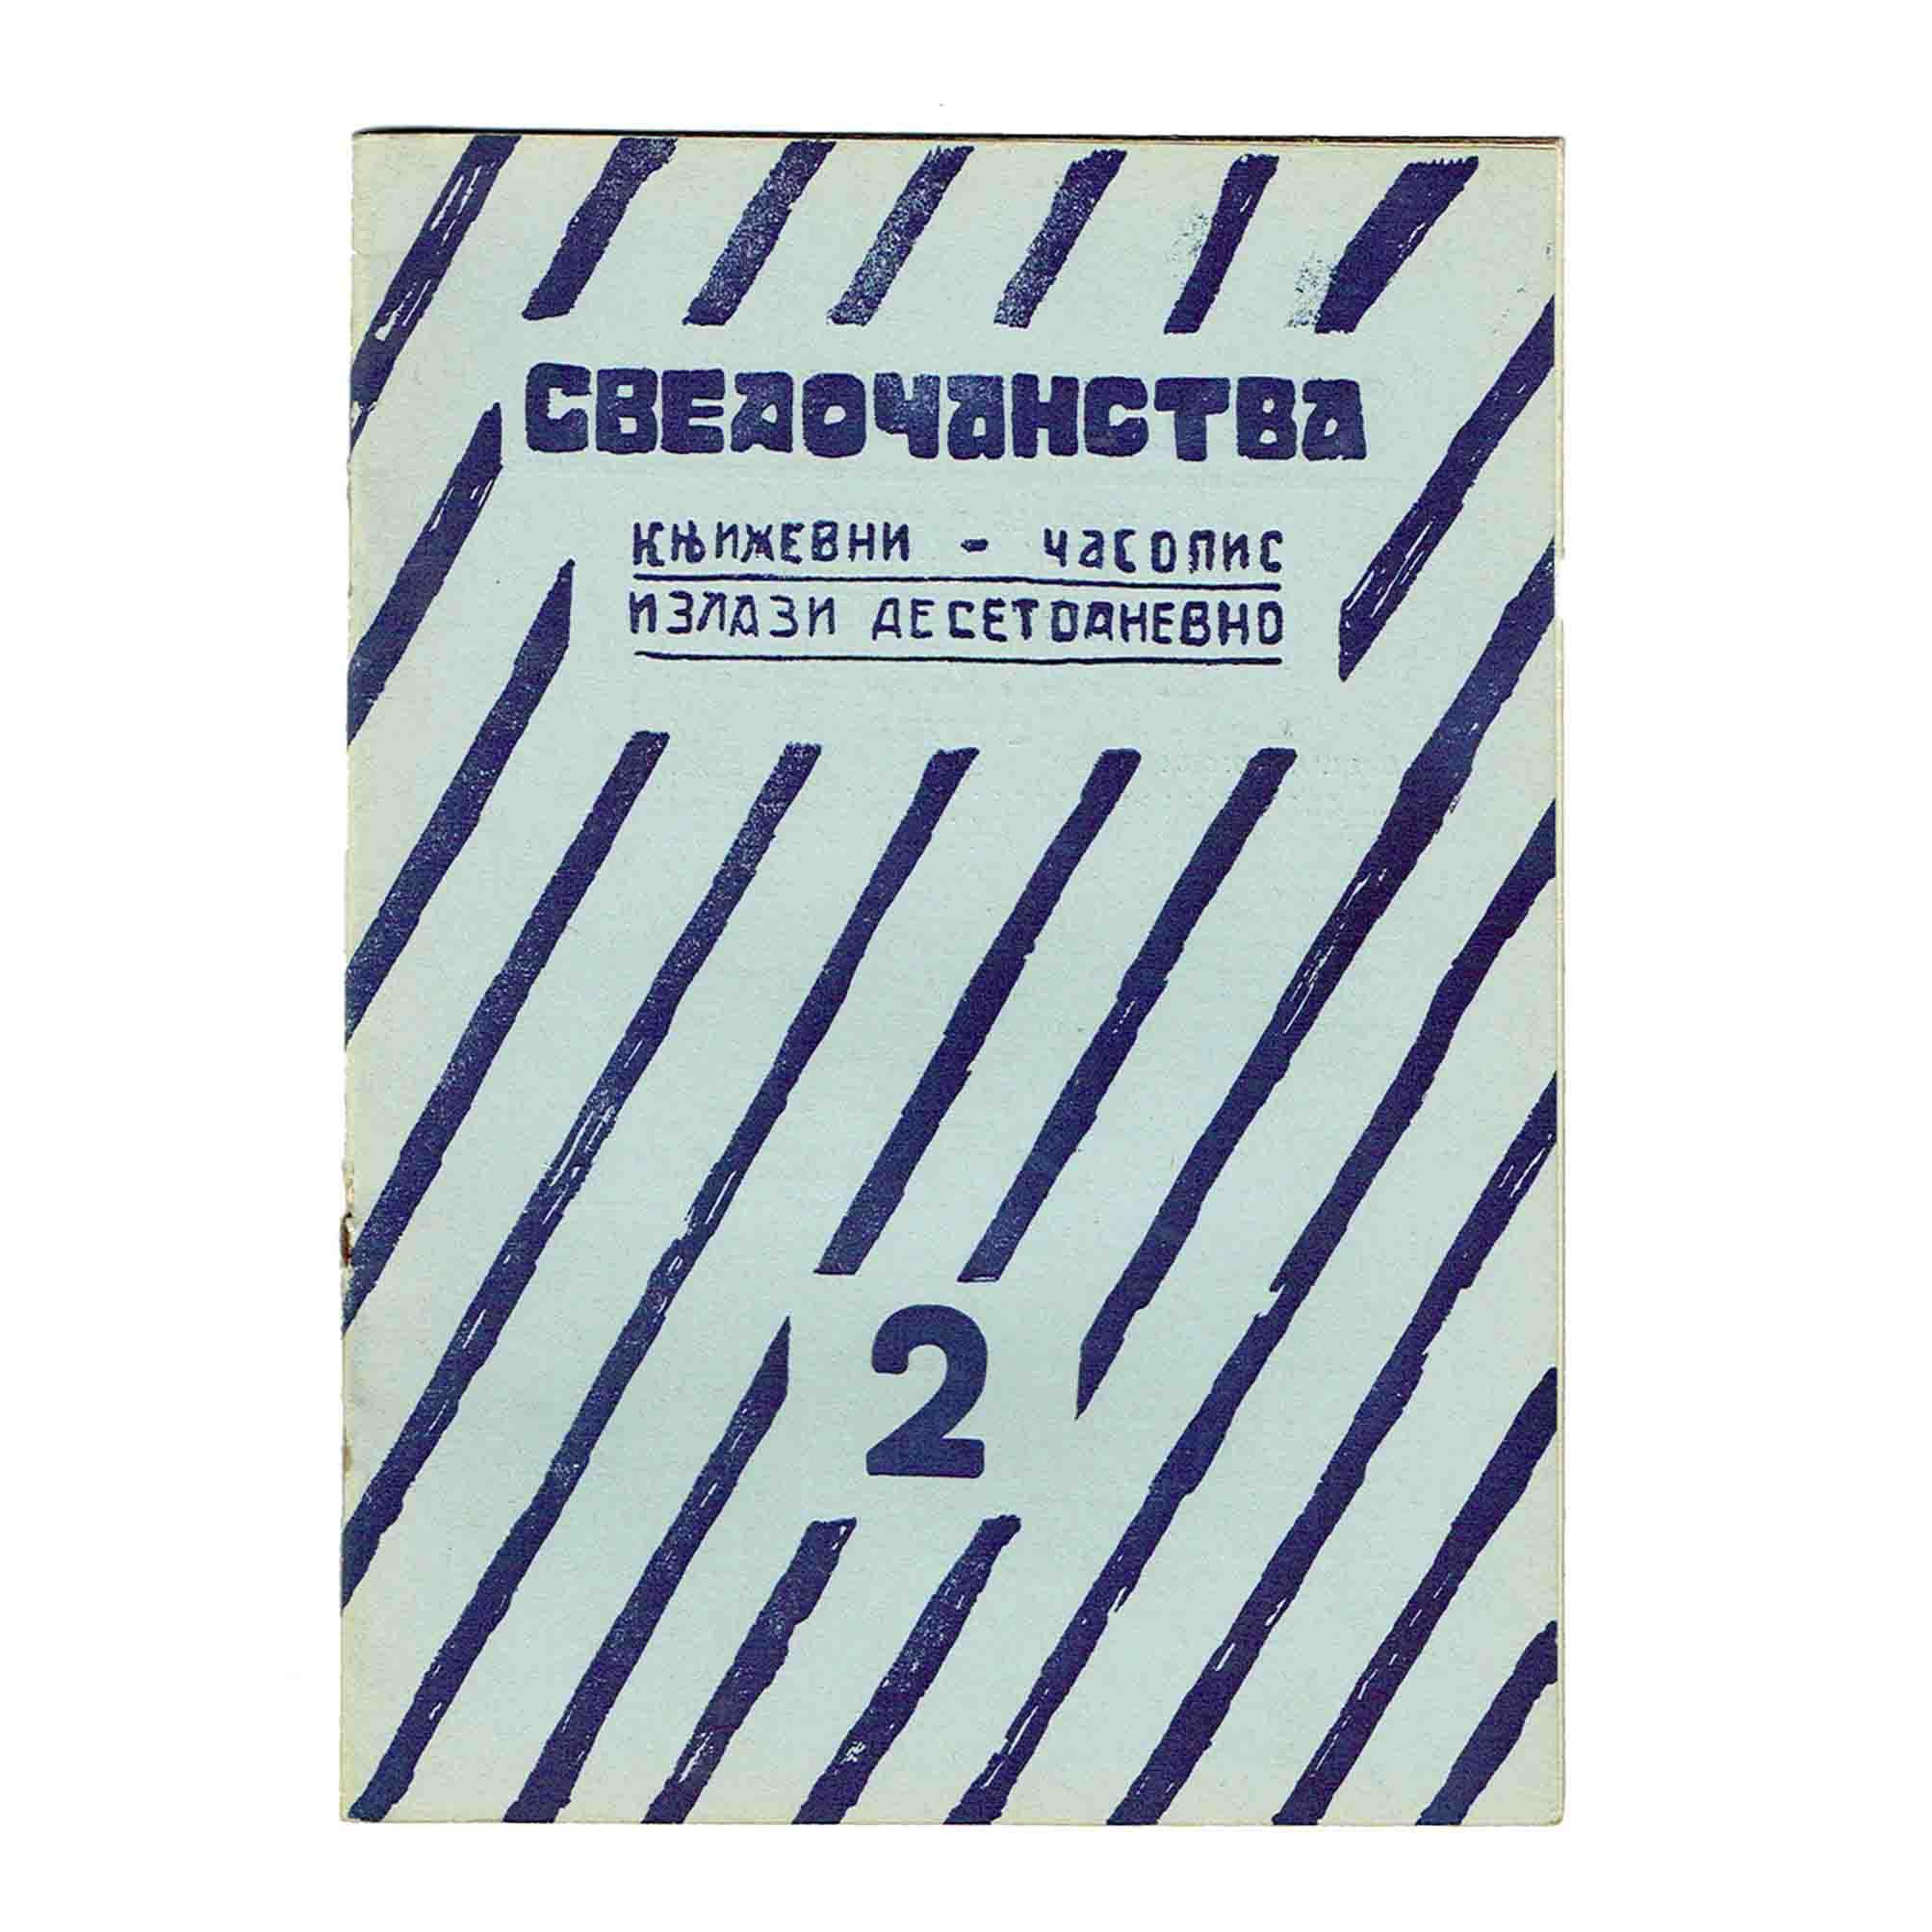 Svedocanstva 2 1924 Cover recto frei N